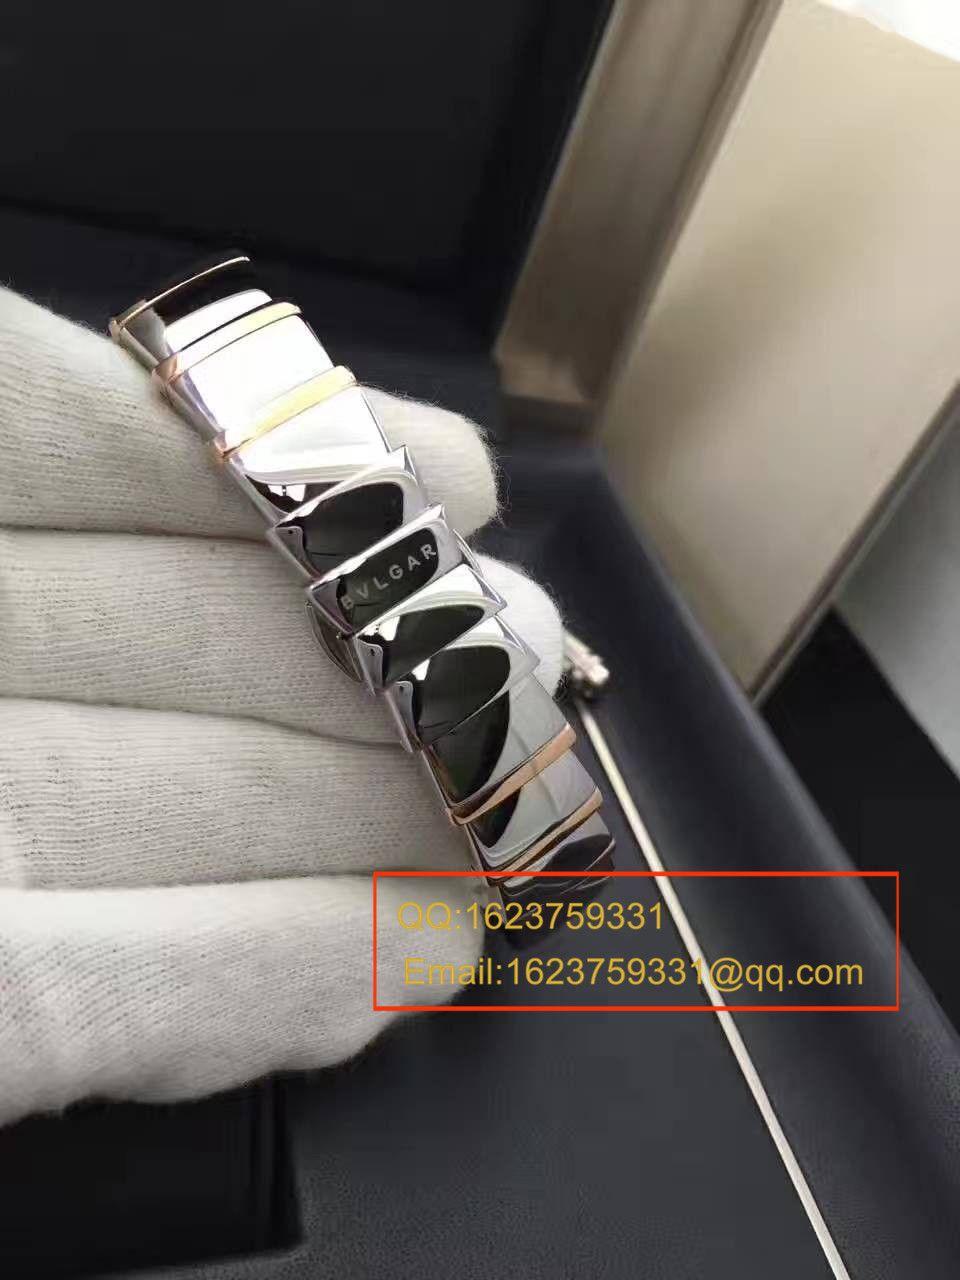 【BV厂一比一超A精仿手表】宝格丽LVCEA系列102198 LU33WSPGSPGD/11女士腕表 / BG017